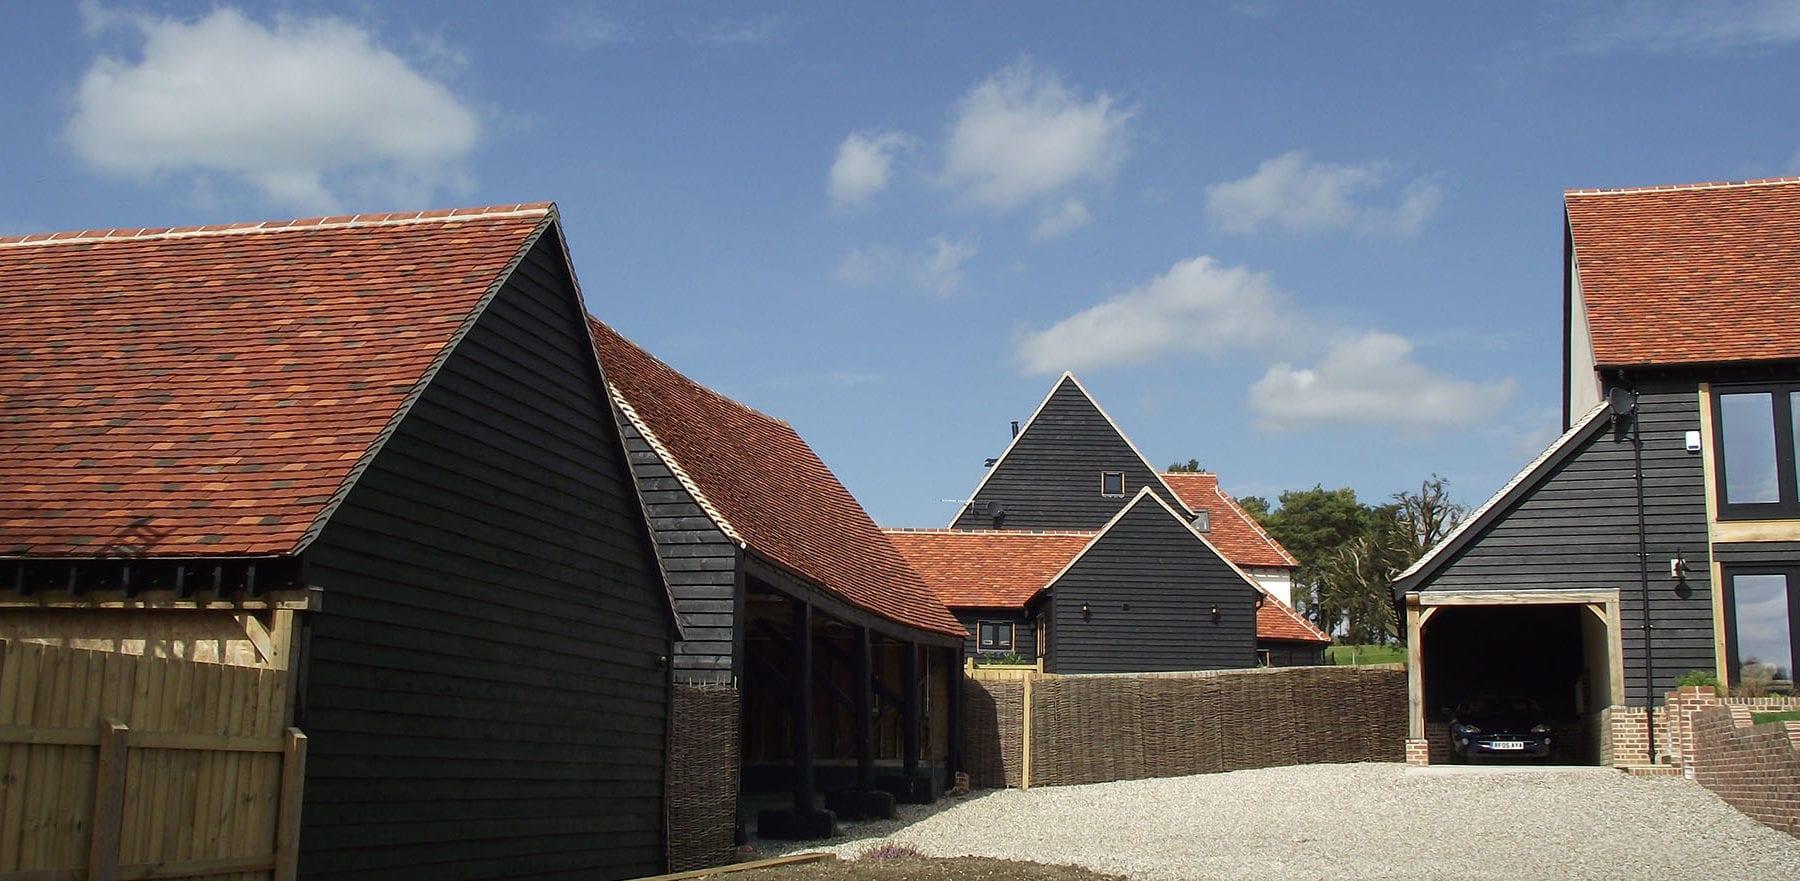 Lifestiles - Handmade Multi Clay Roof Tiles - De Vere, England 6